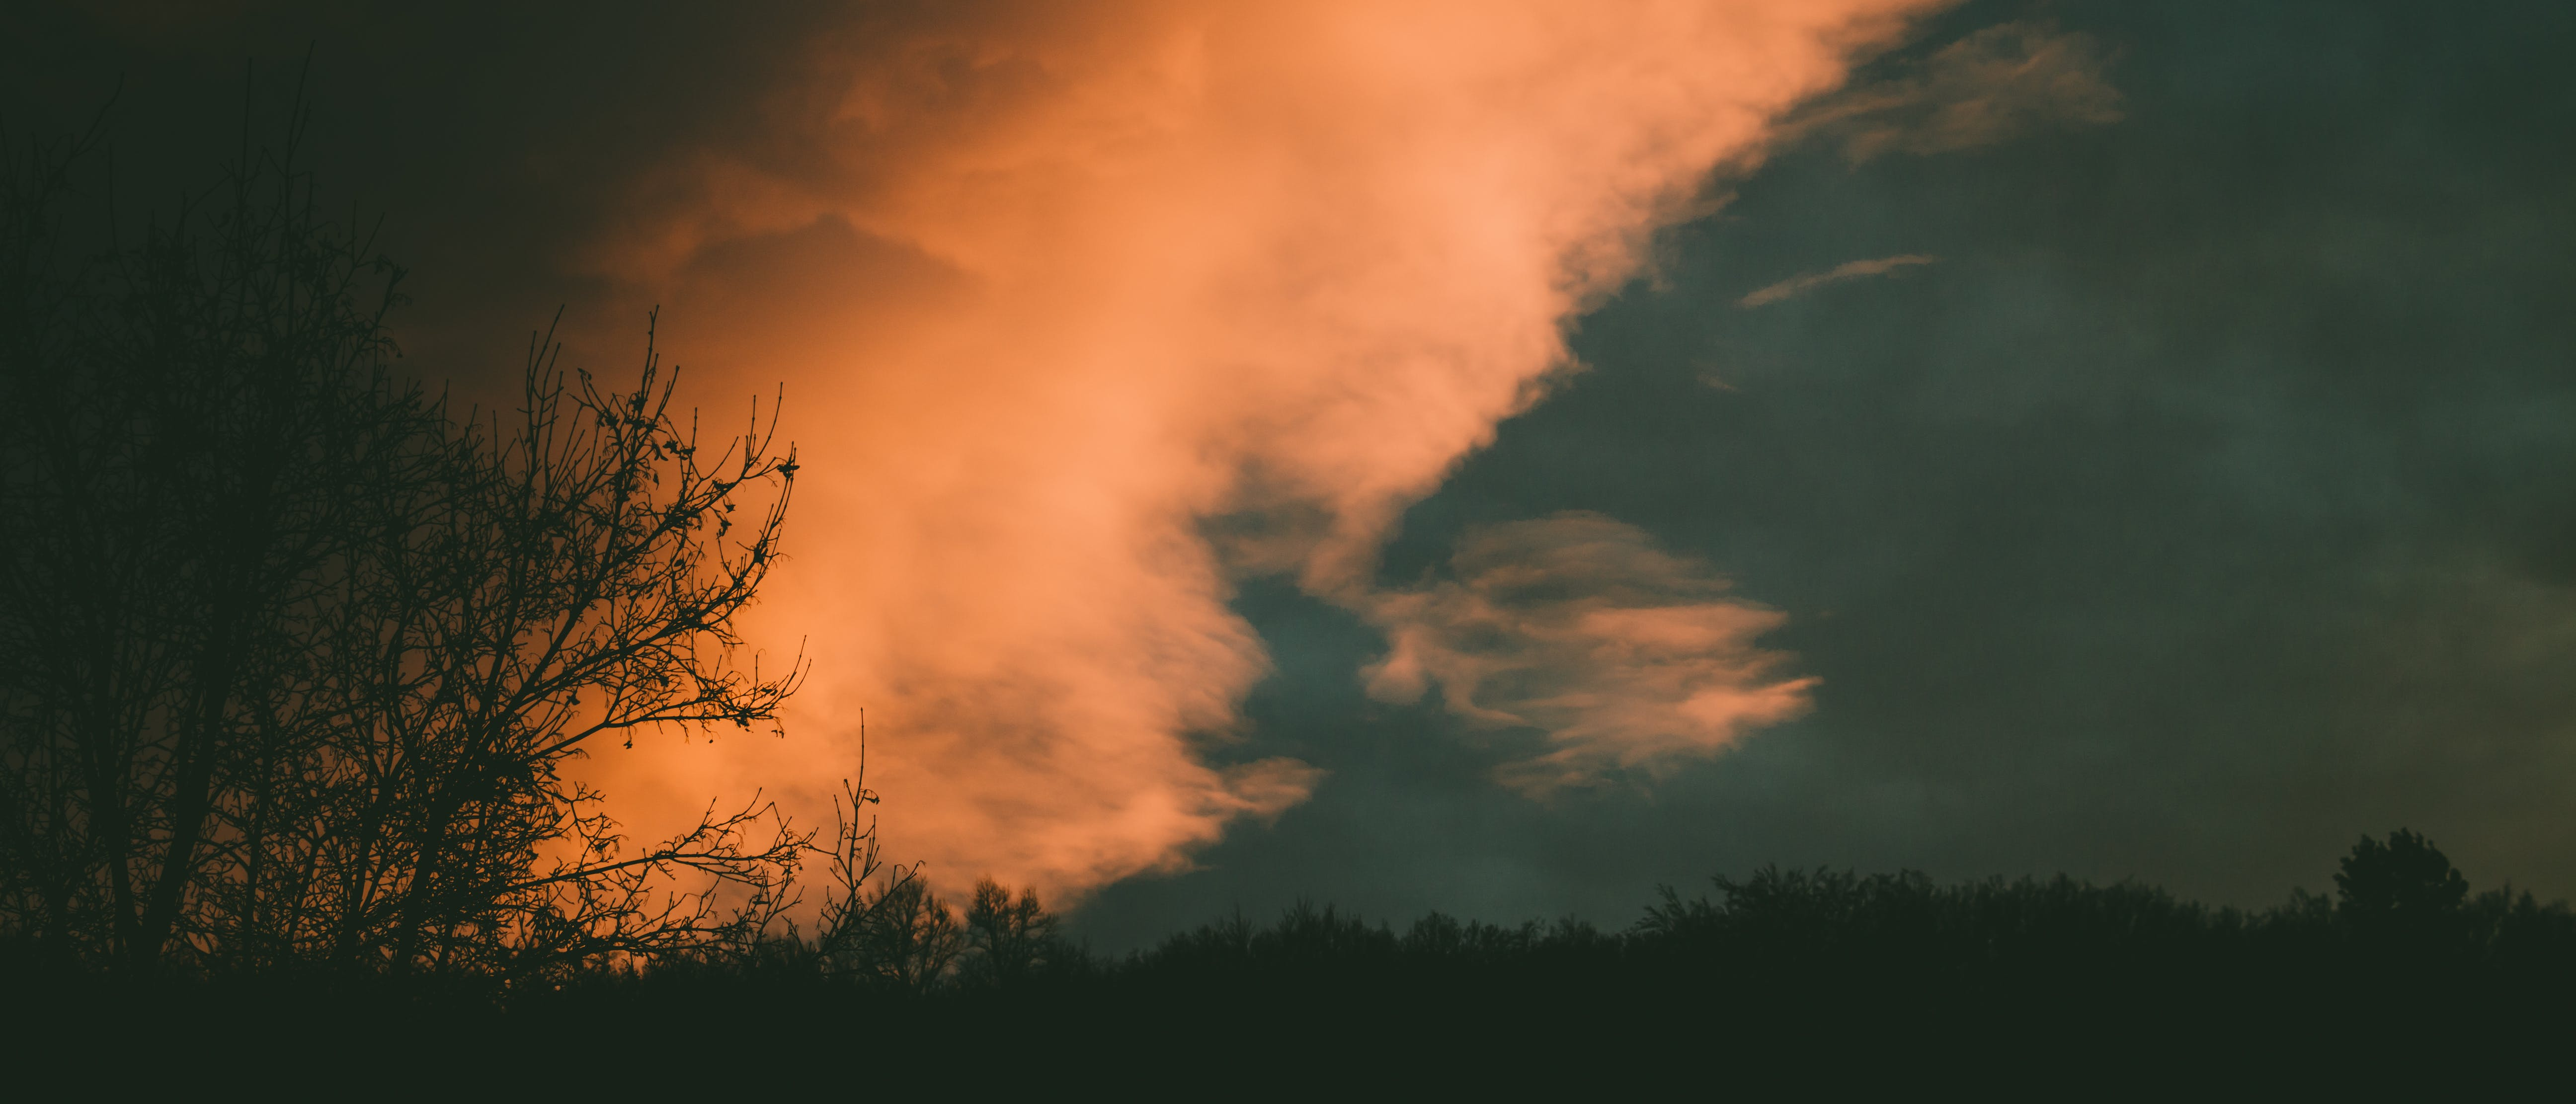 Gratis stockfoto met achtergrondlicht, avond, bomen, donker